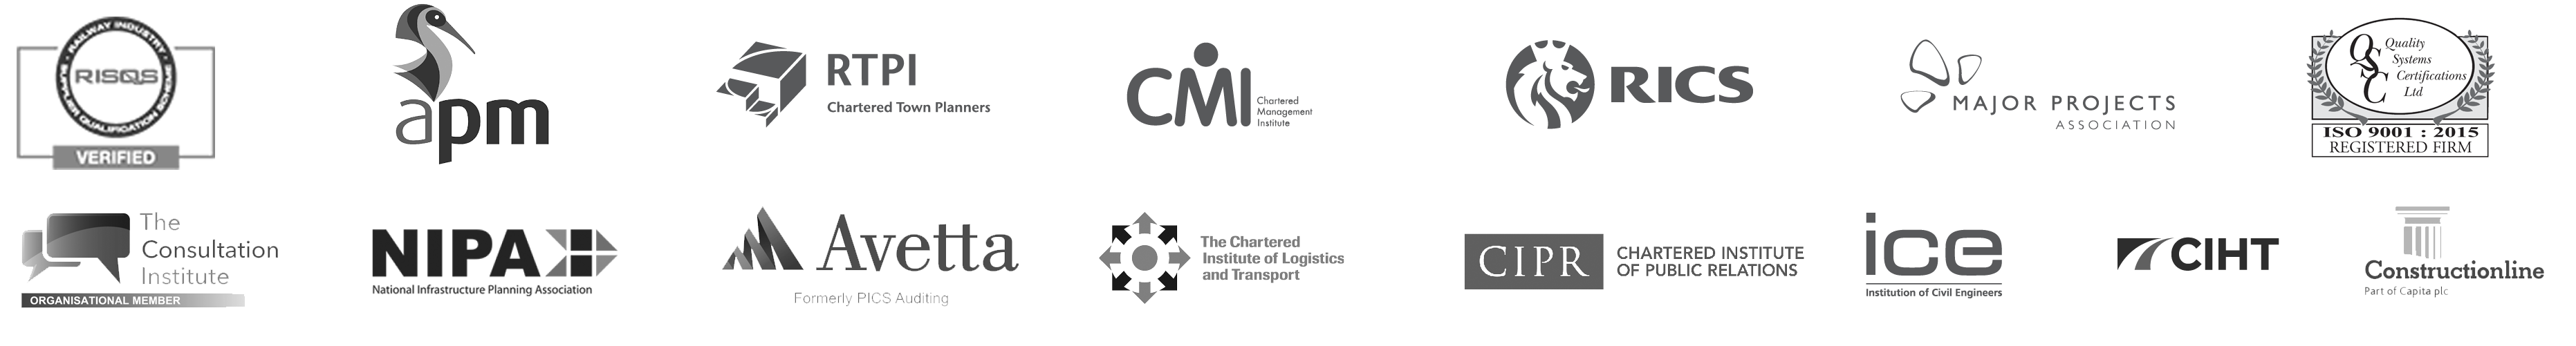 cj associates footer affiliate logos